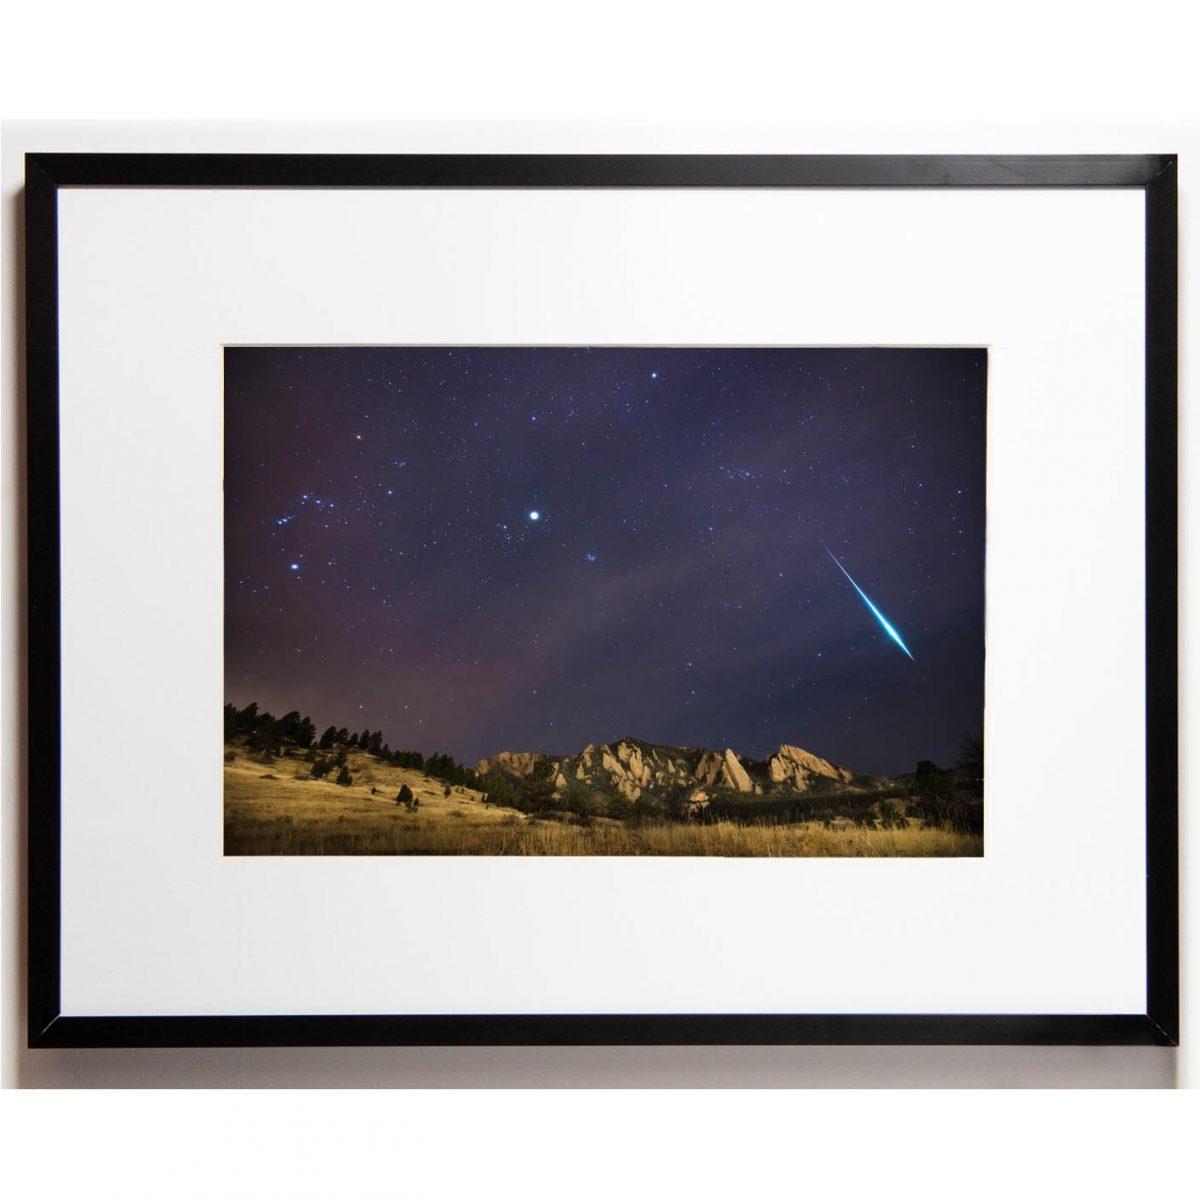 Cullis 8x12 framed - Flatiron Fireball cropped